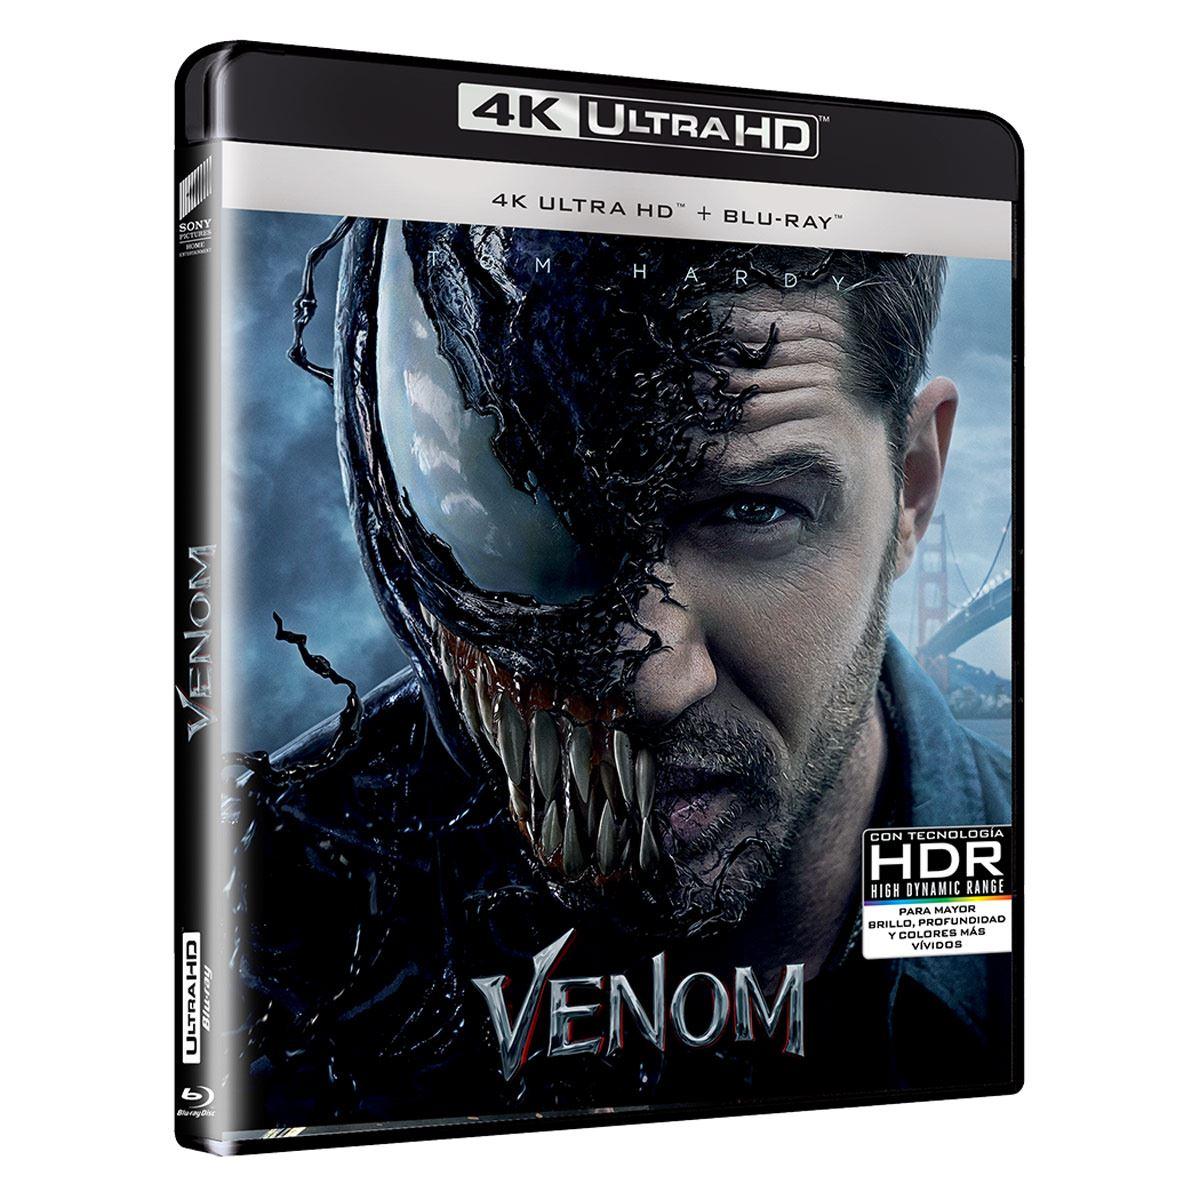 4K UHD Venom